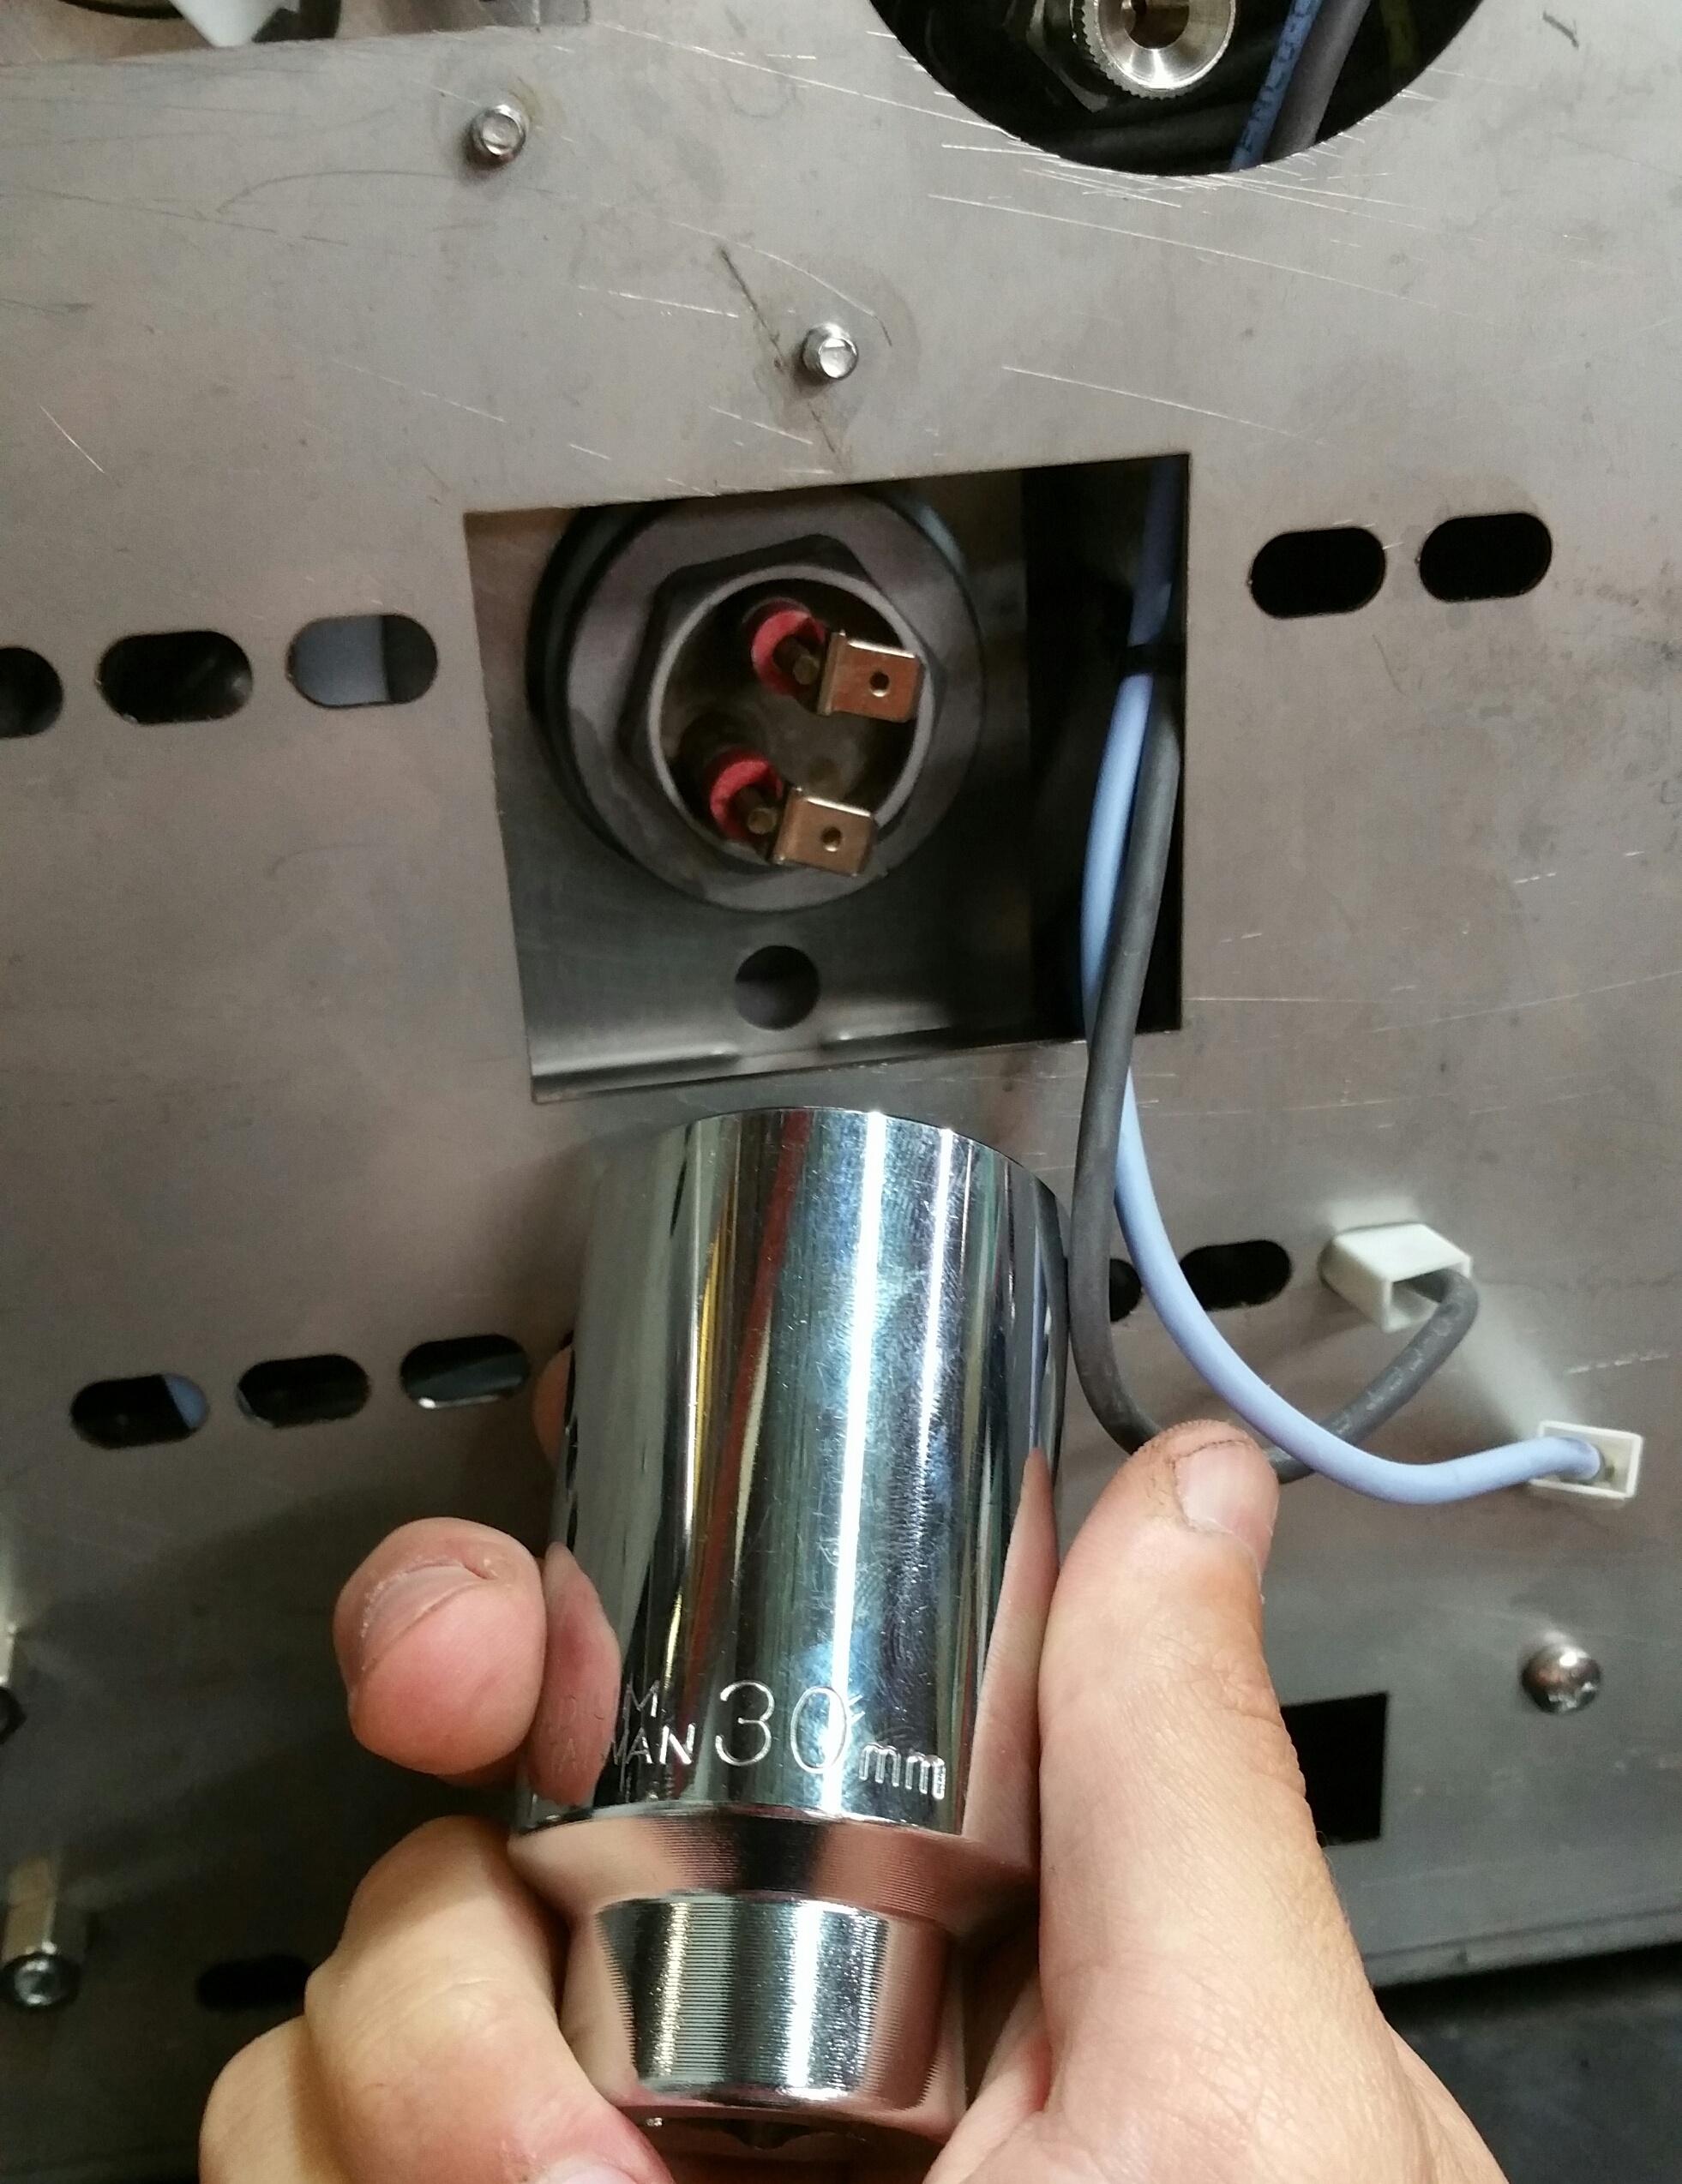 LUCCA M58: Replacing Coffee Boiler Element